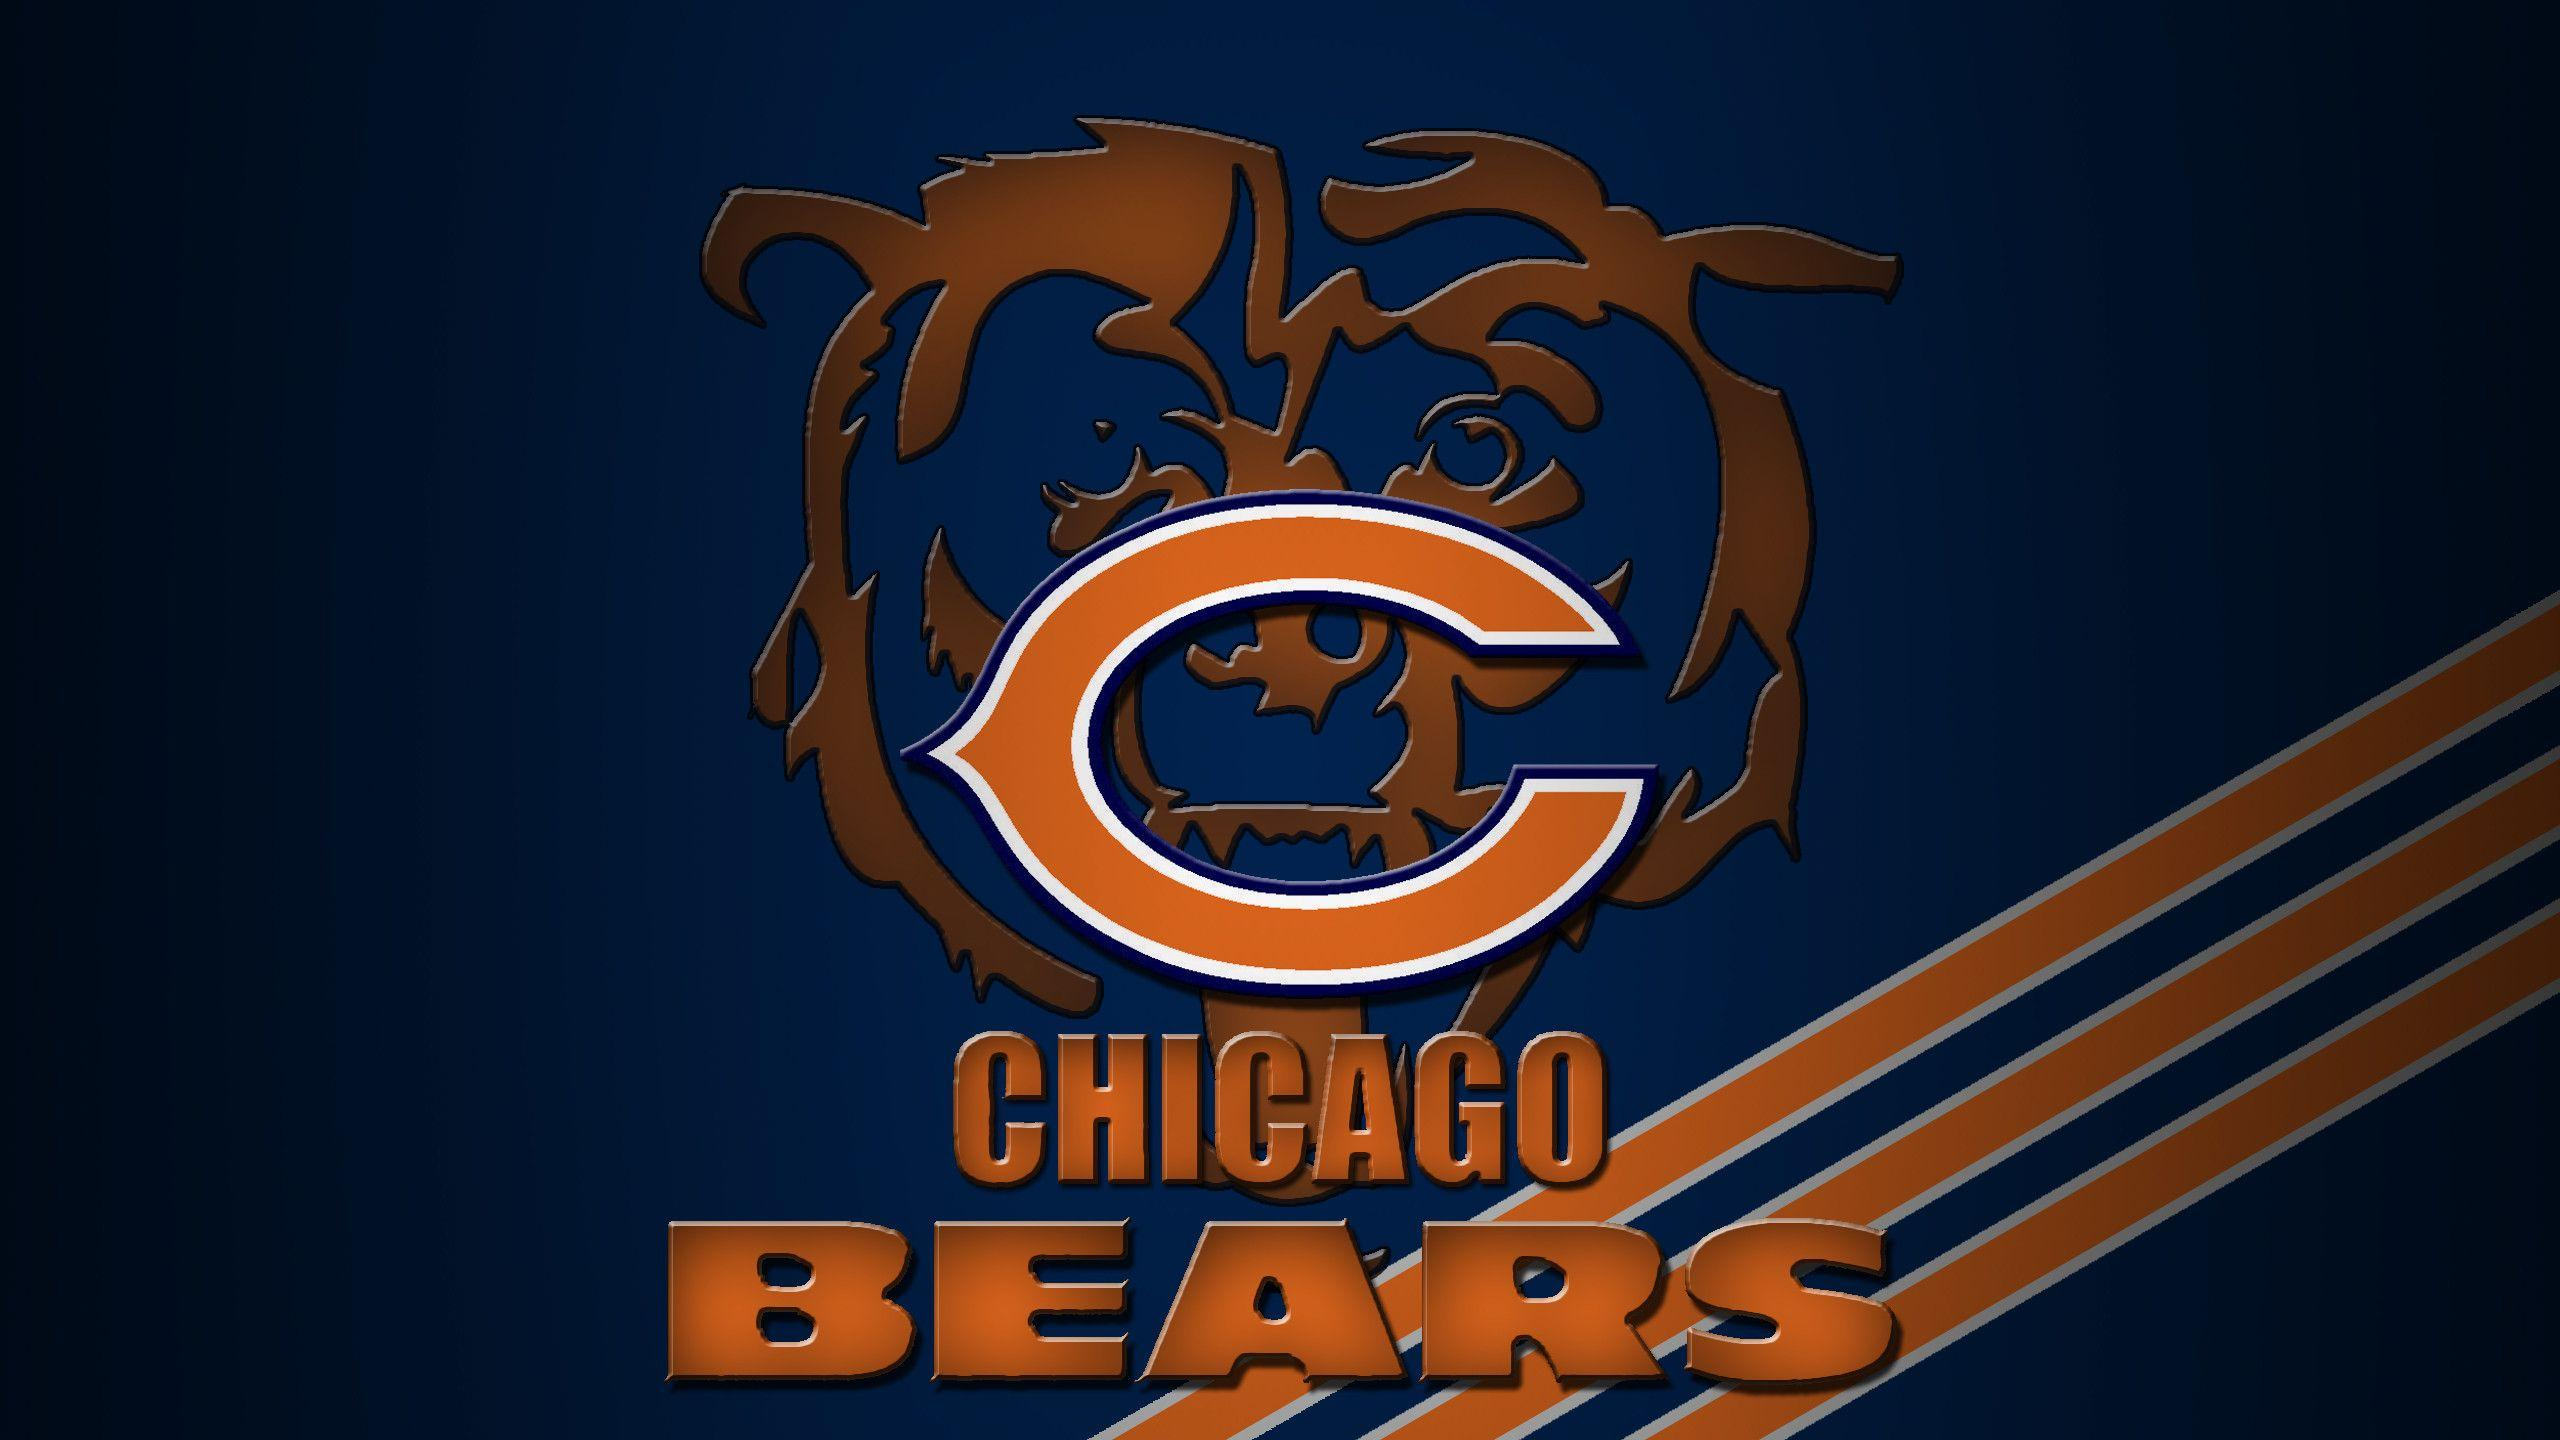 Chicago Bears Football Wallpapers   4k HD Chicago Bears Football 2560x1440